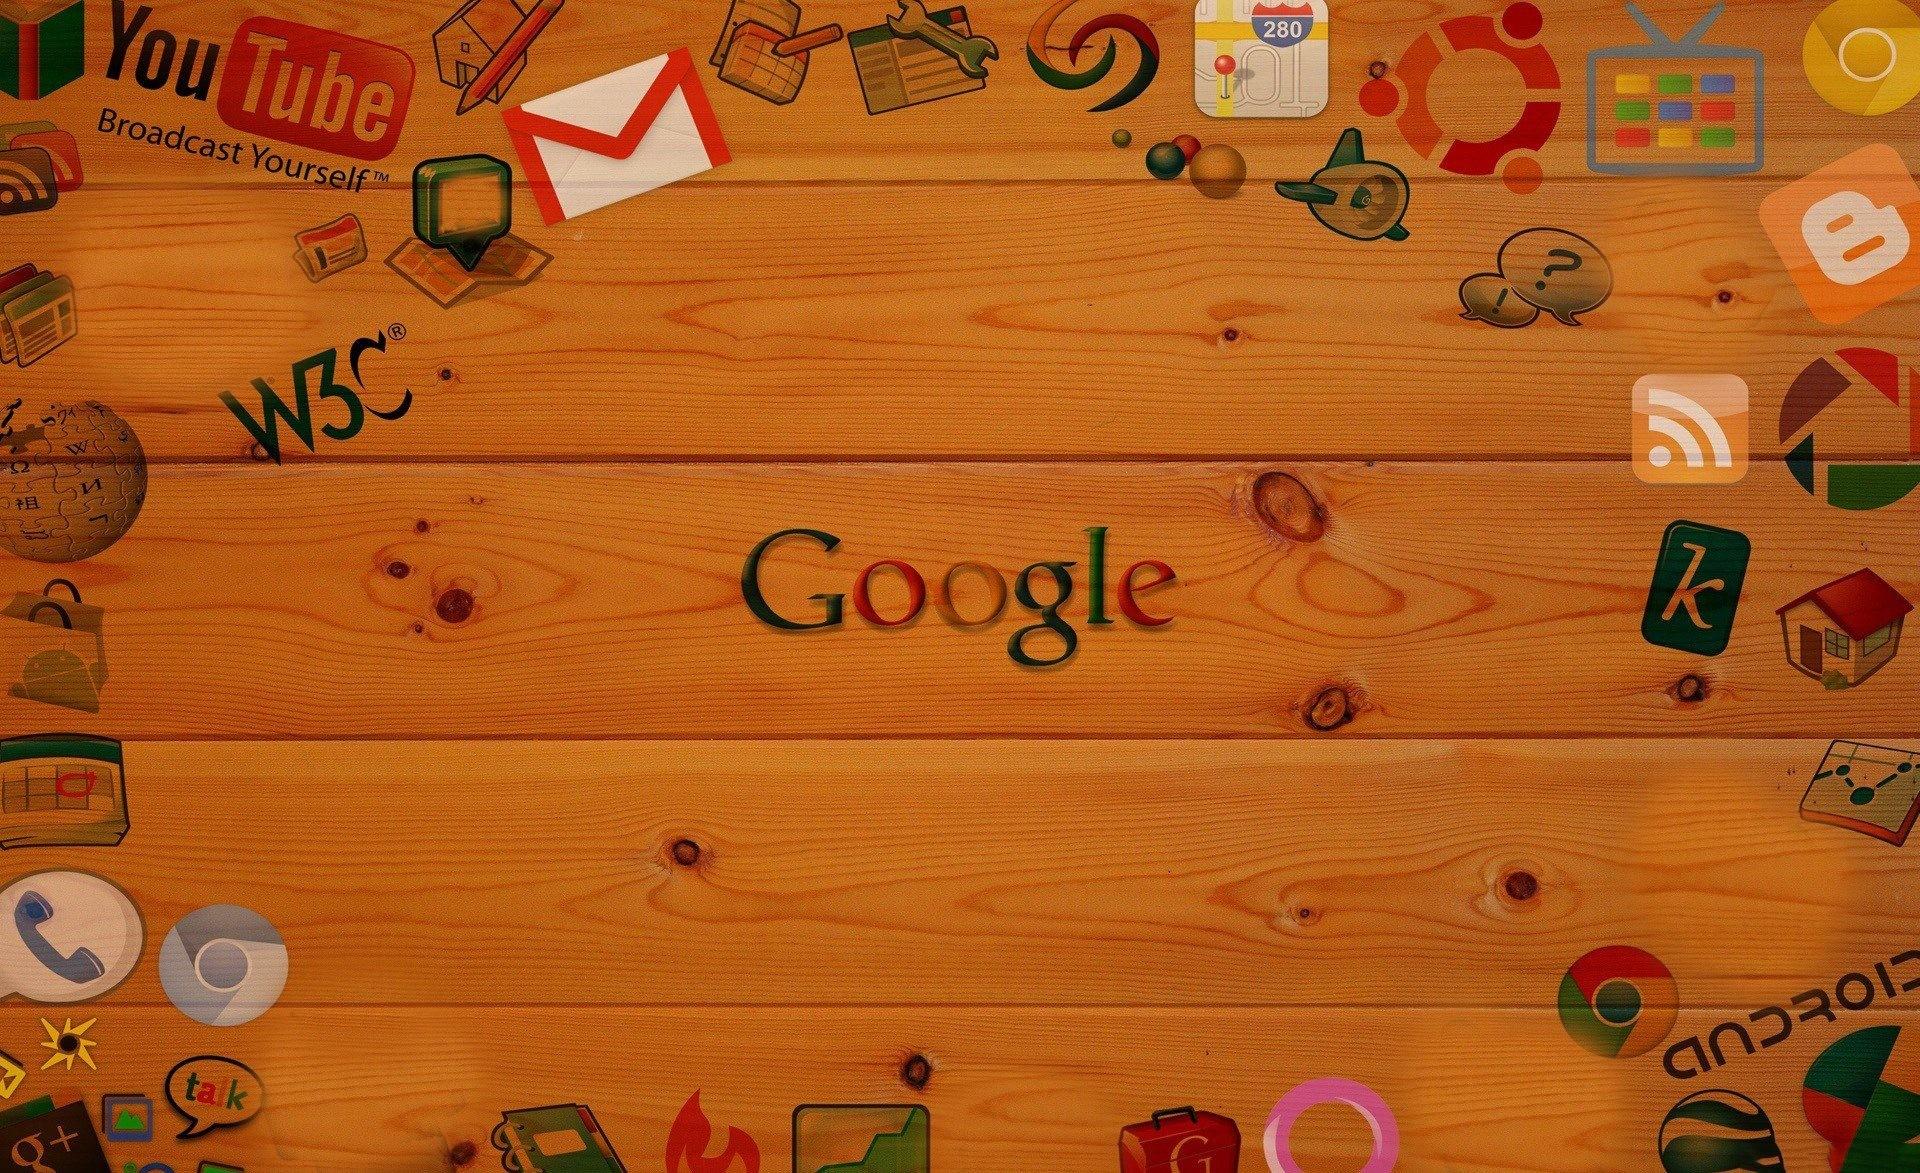 Free Google Wallpaper Hd Logo-1080p Resolution | Unique HD Wallpapers